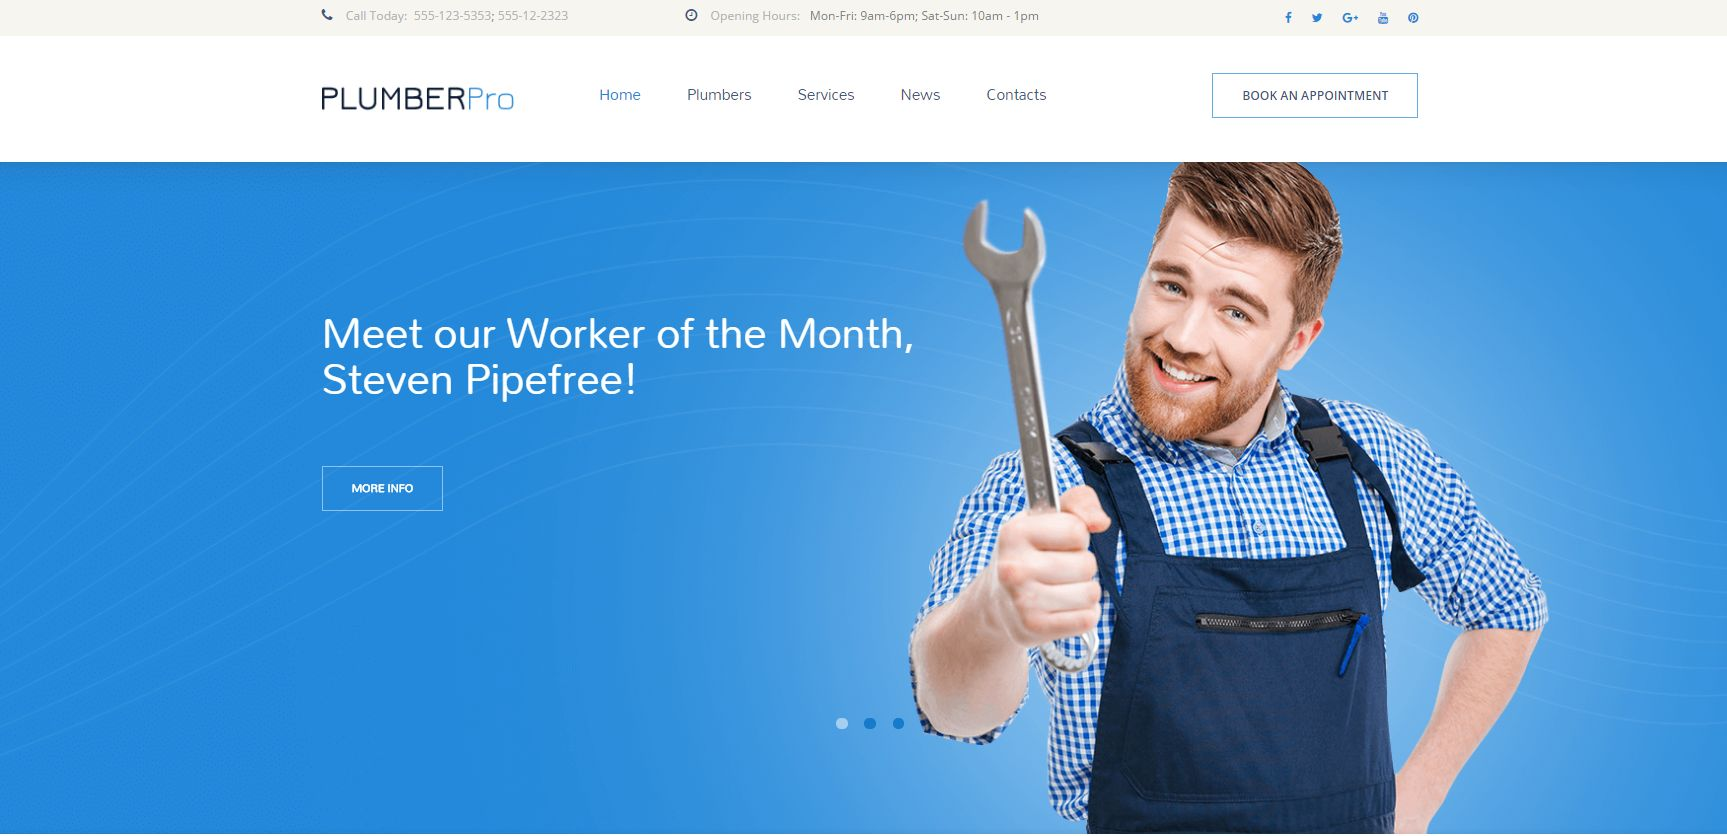 Plumbing Services Responsive WordPress Theme